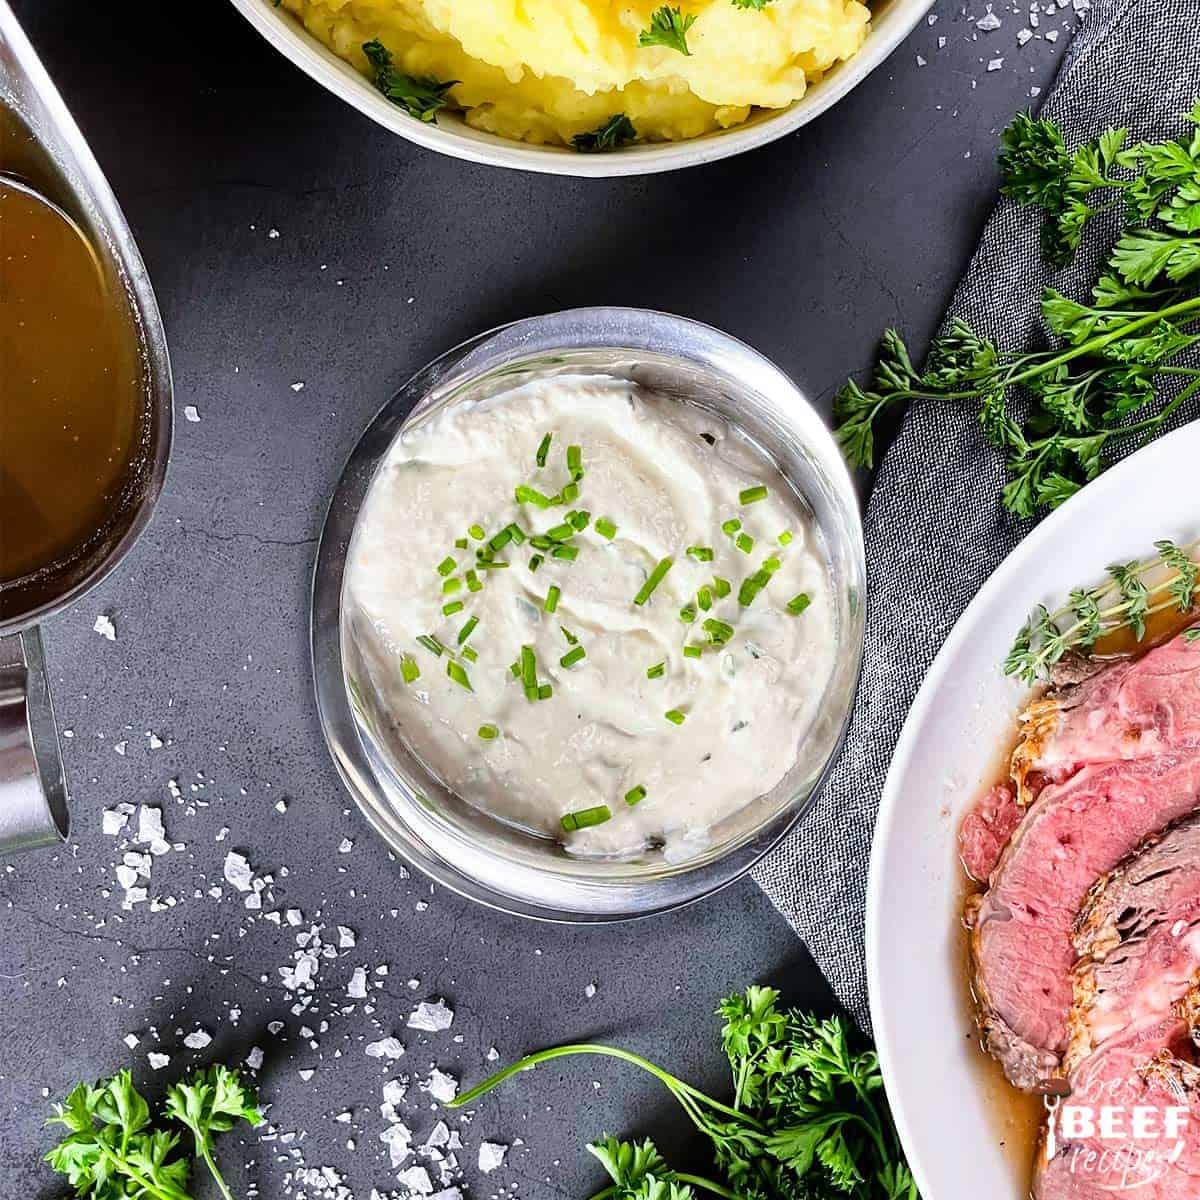 Horseradish sauce in a bowl